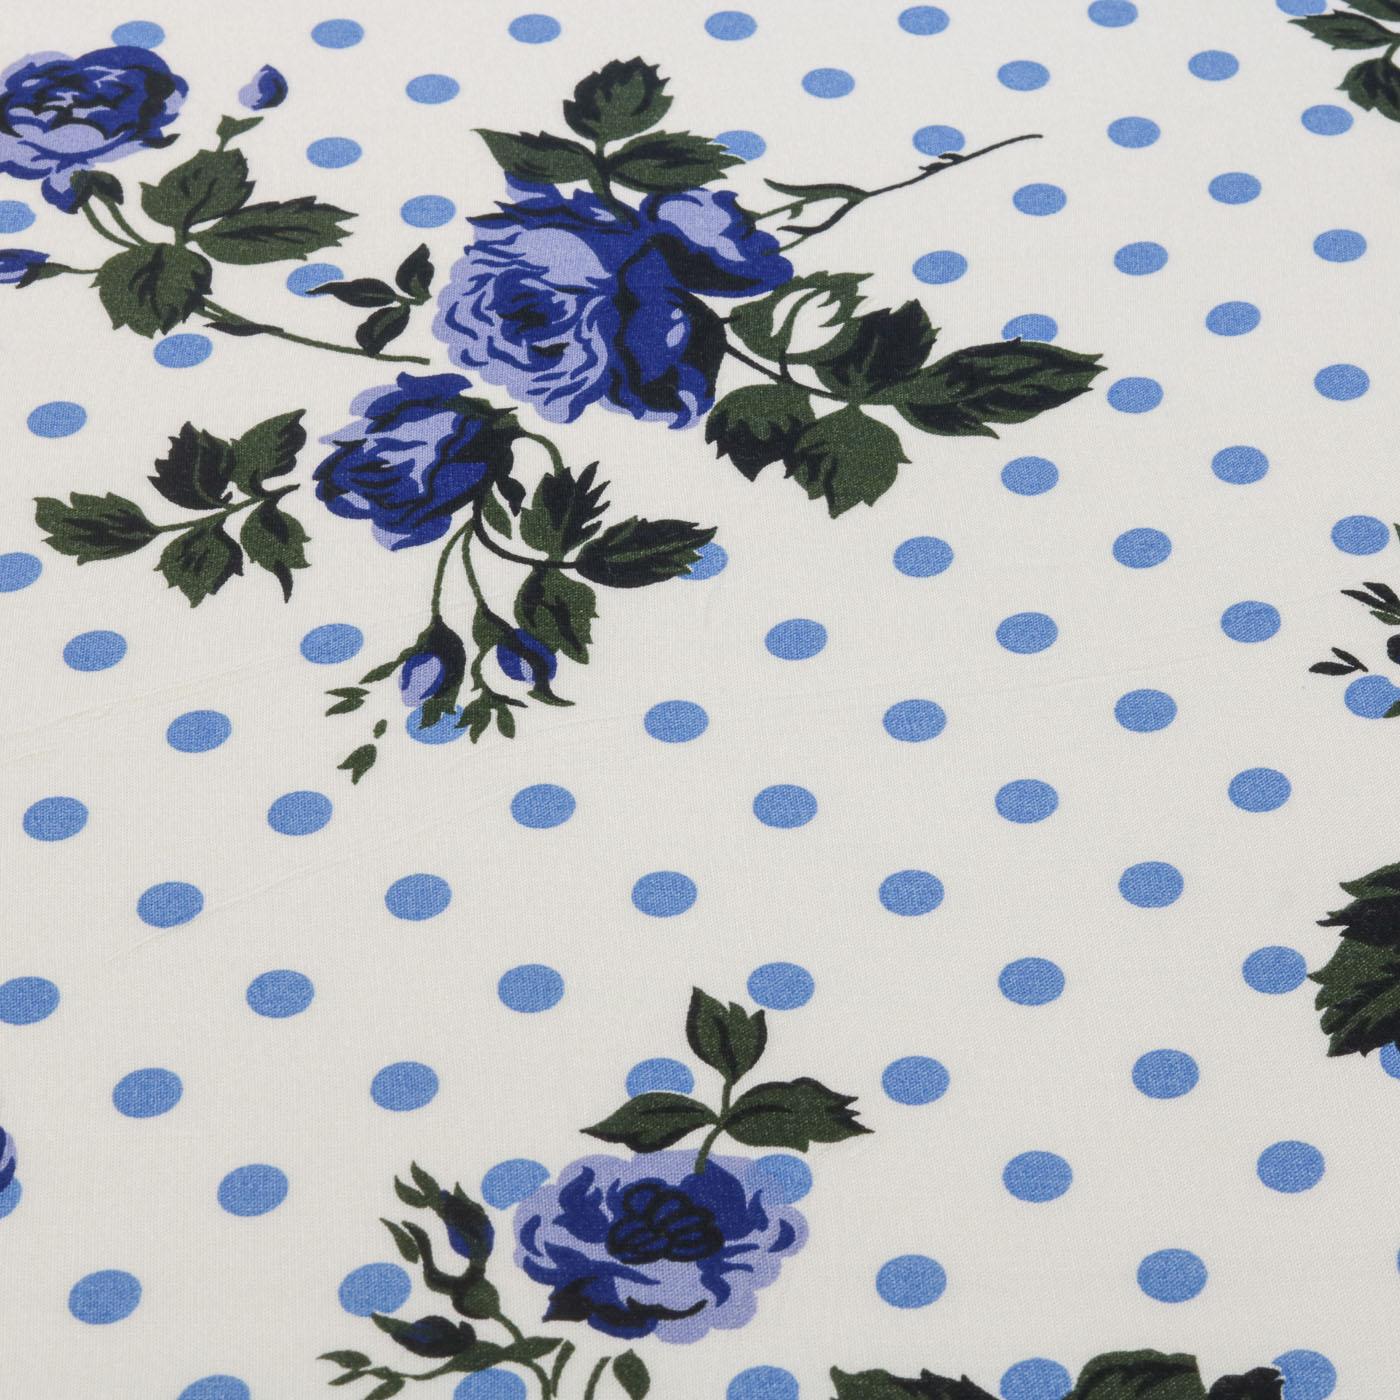 Tecido Viscose Estampado Poa Floral 100% Viscose Azul Turquesa